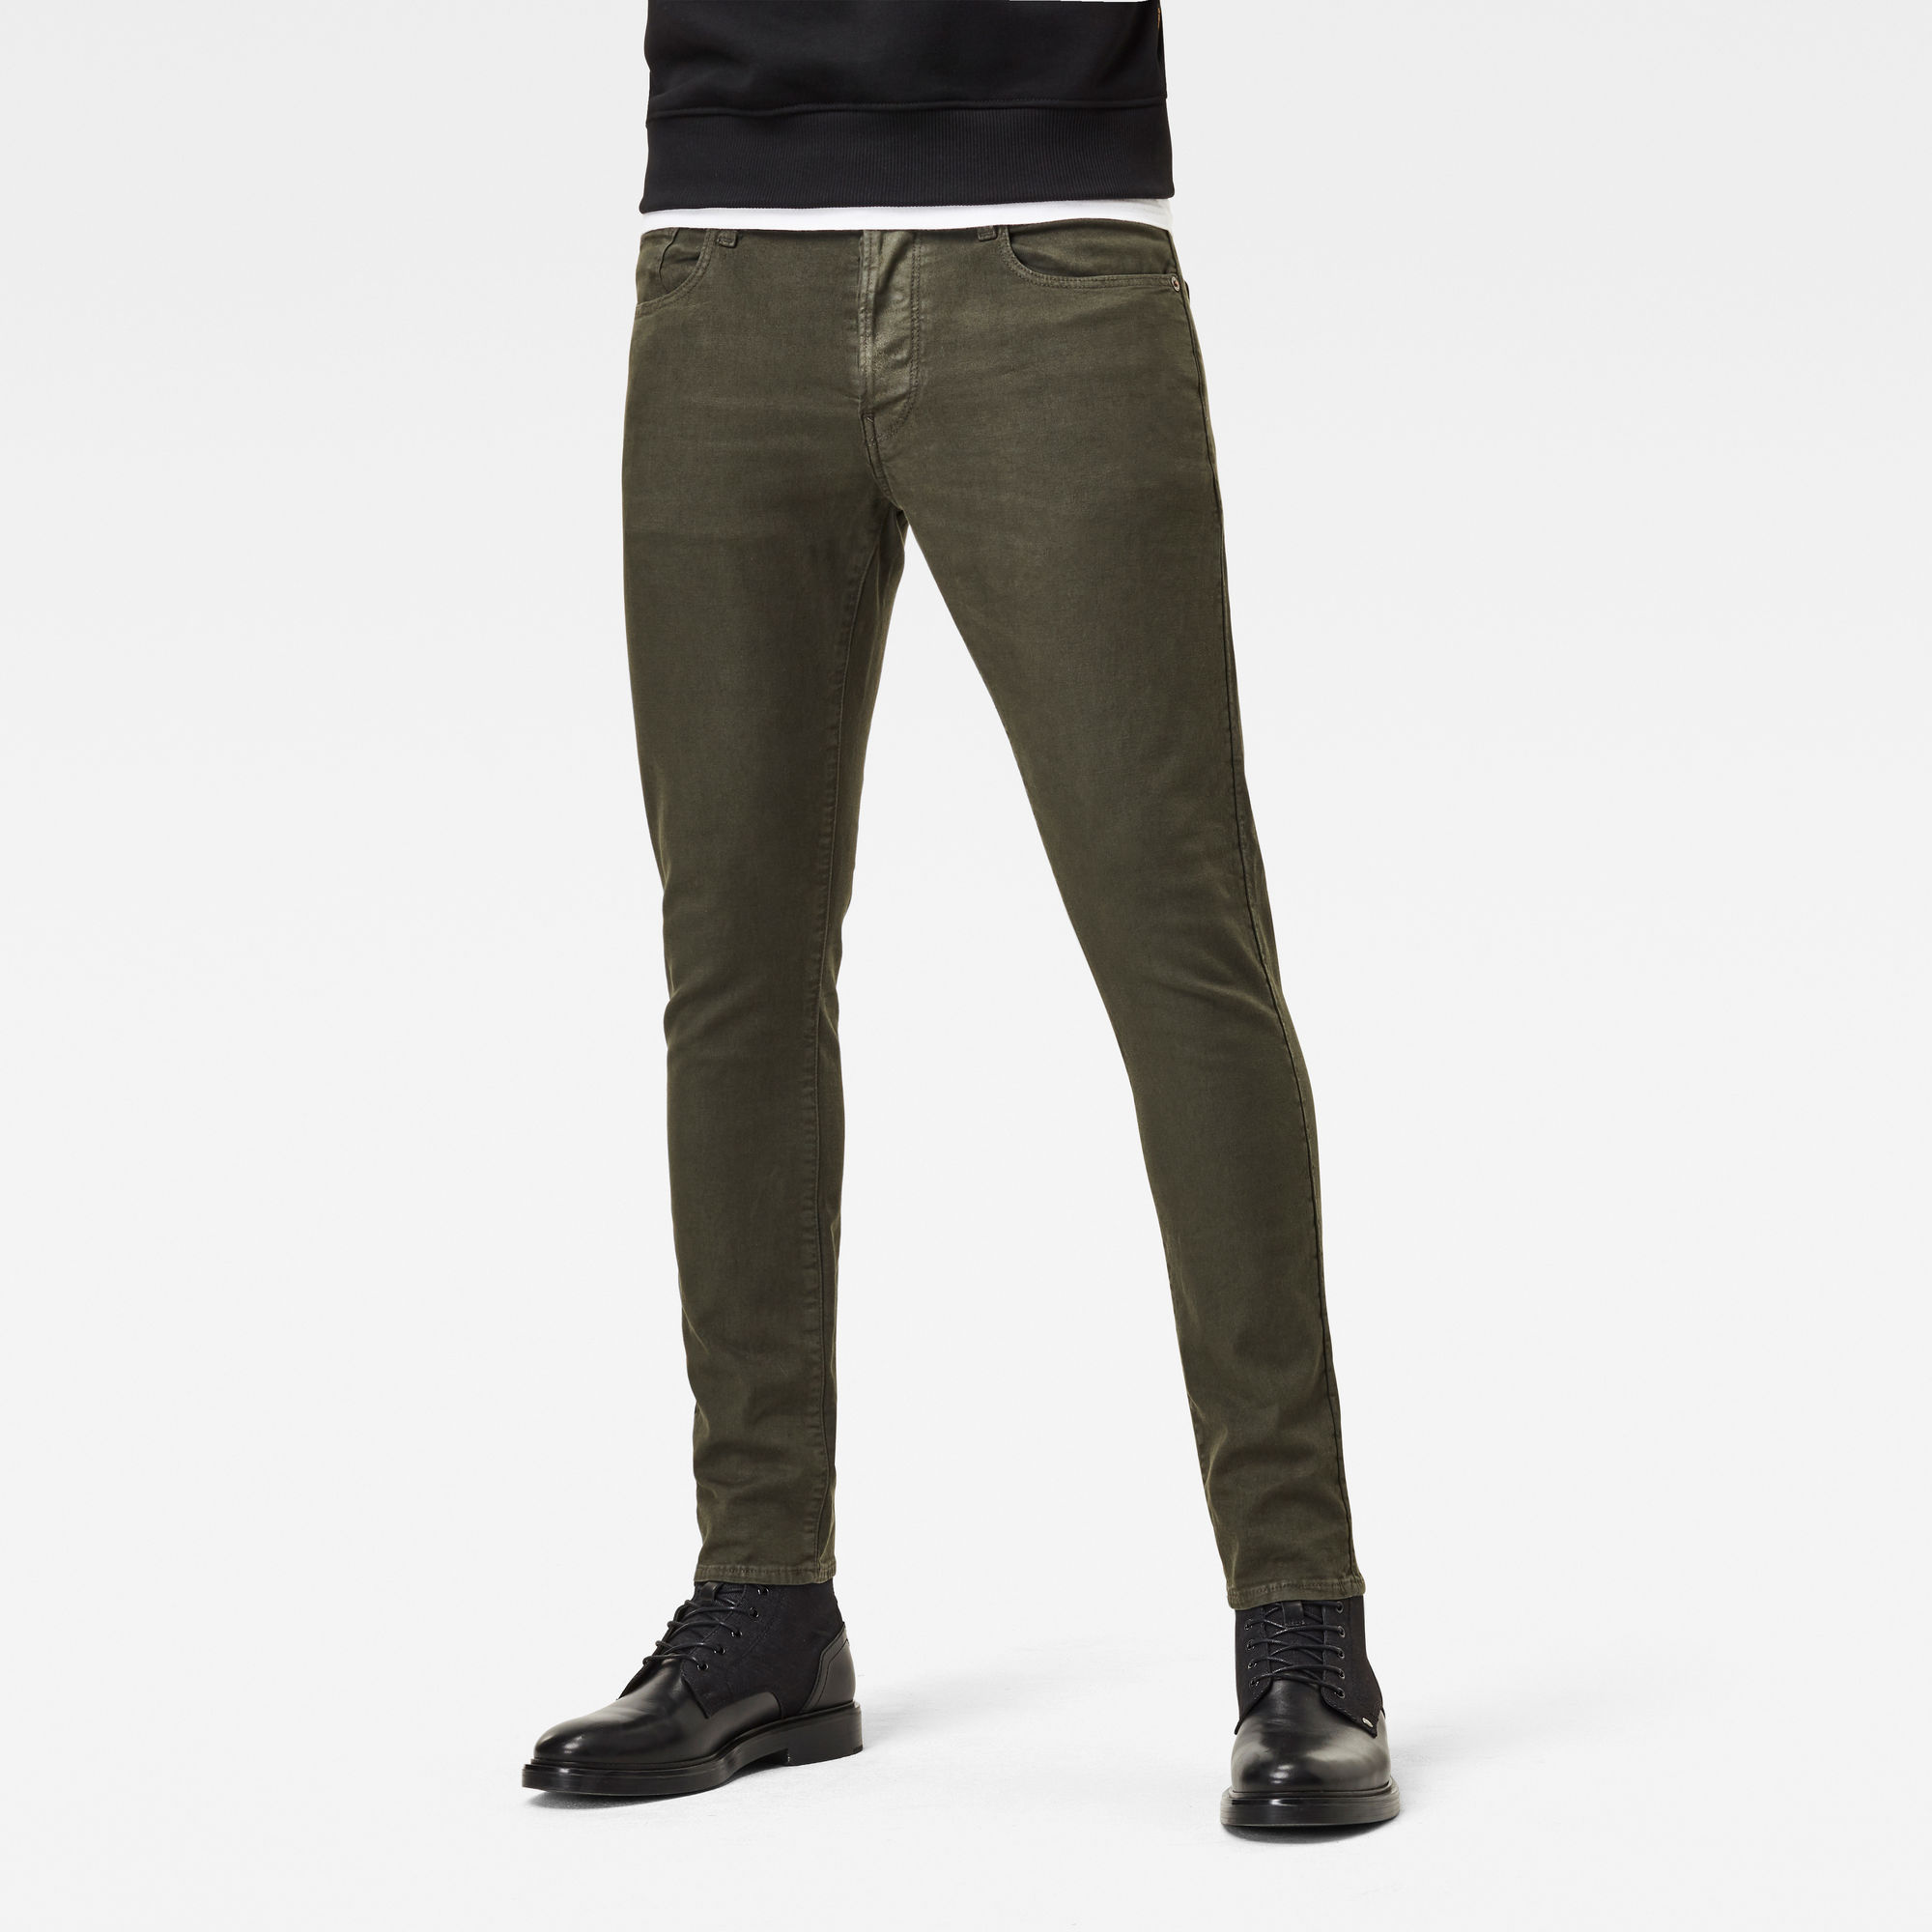 G-Star RAW Heren 3301 Slim Gekleurde Jeans Groen